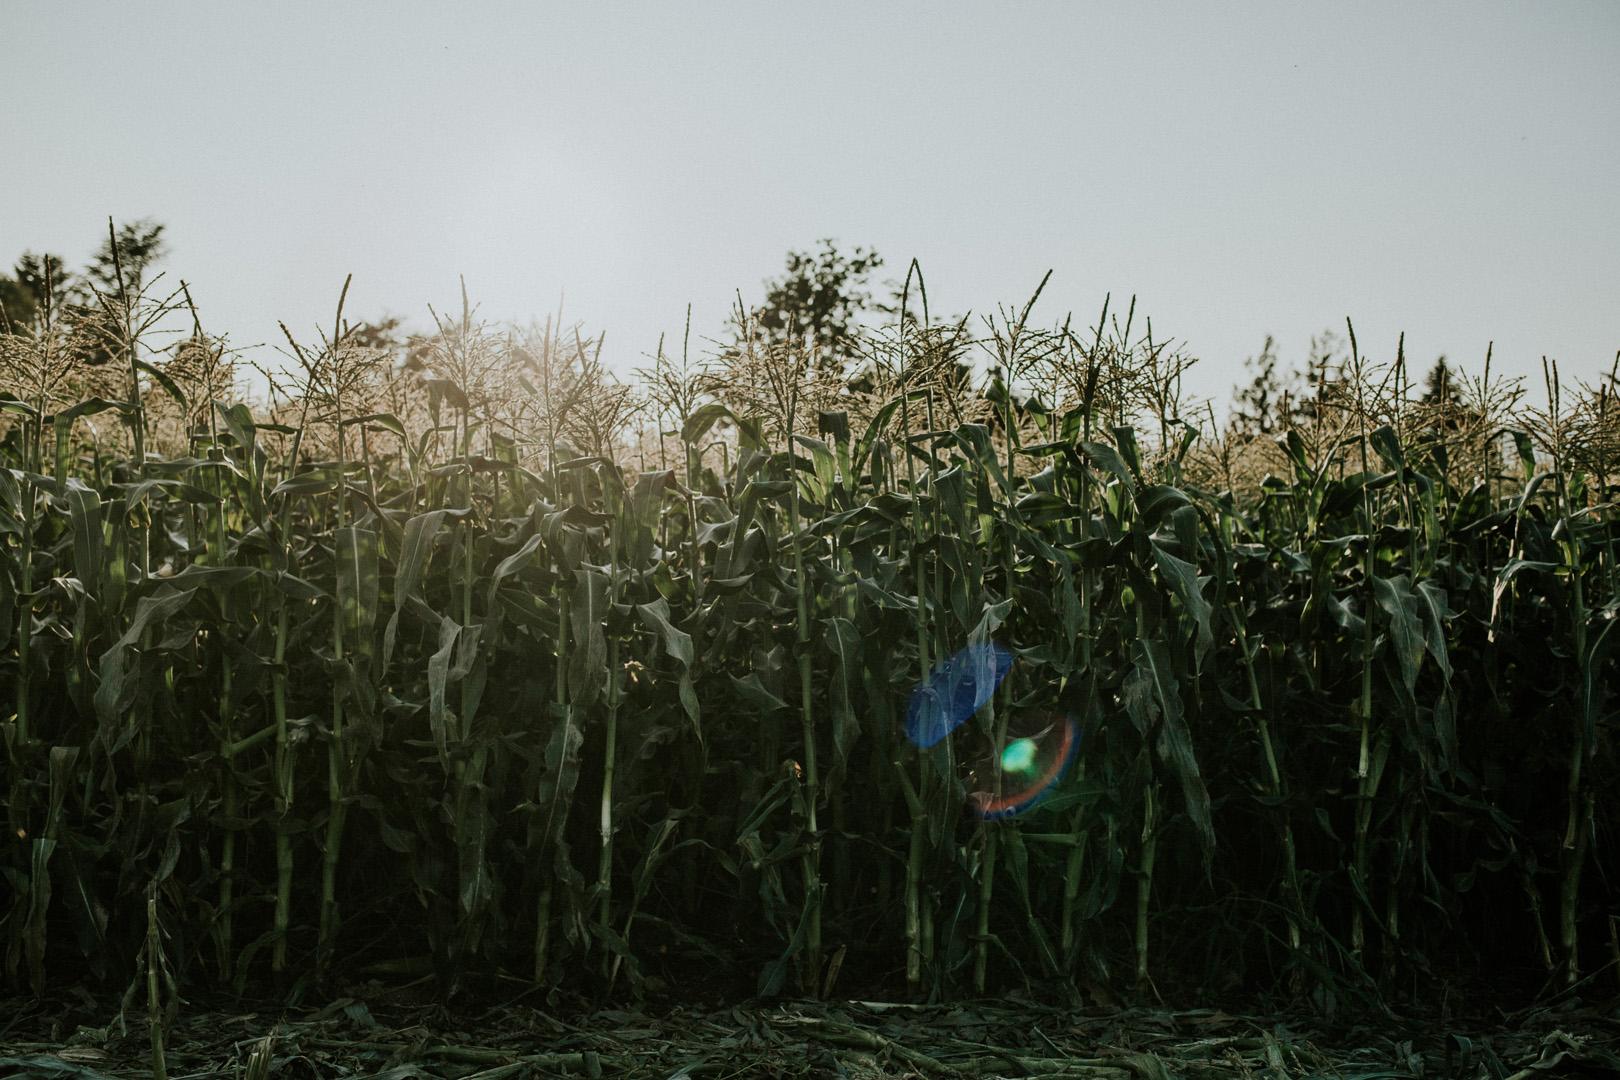 robyn-bessenger-photography-75.jpg